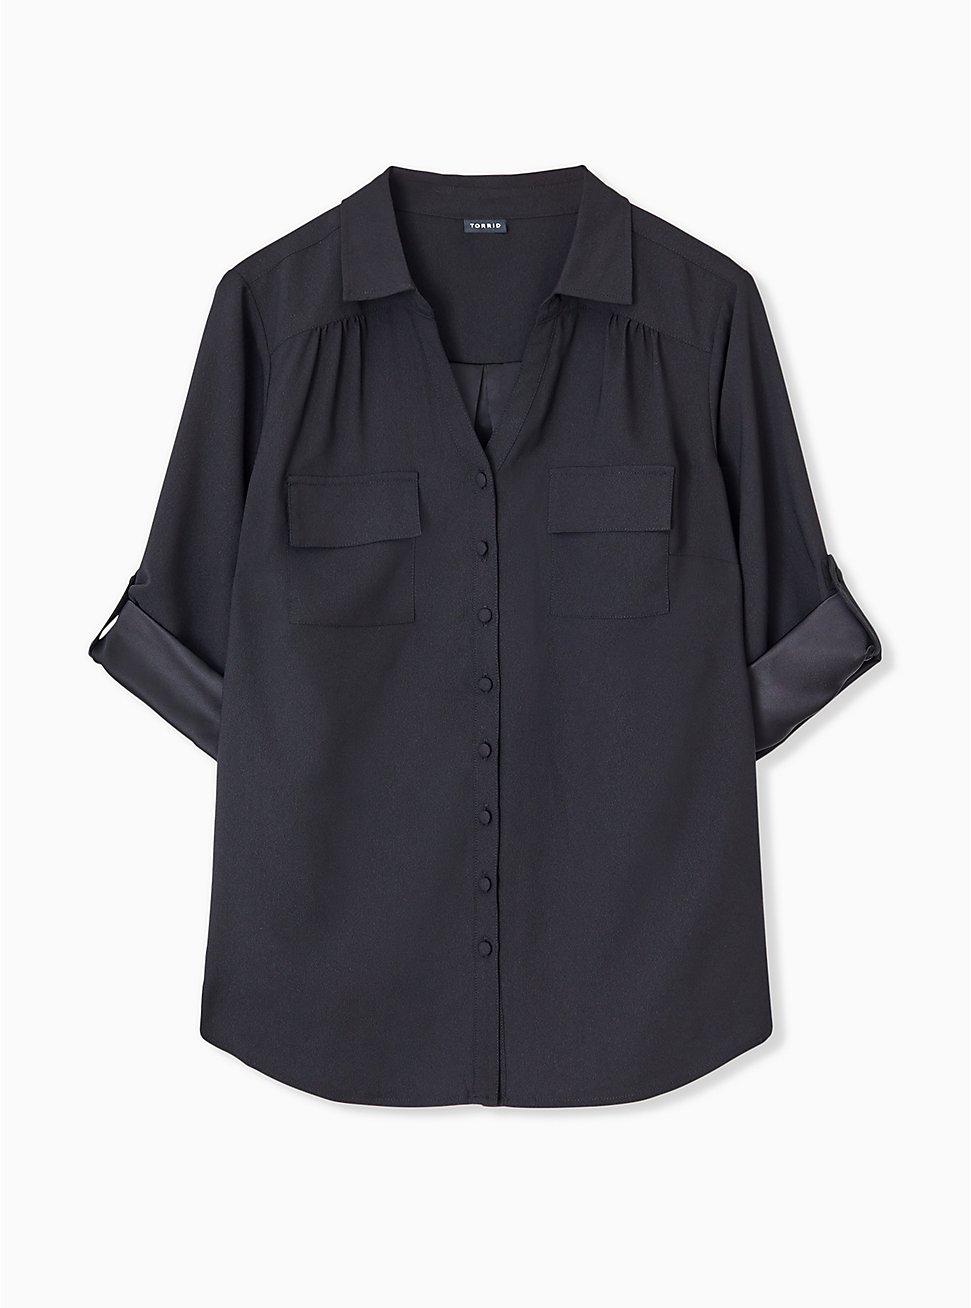 Madison - Black Crepe Back Satin Button Front Blouse , DEEP BLACK, hi-res